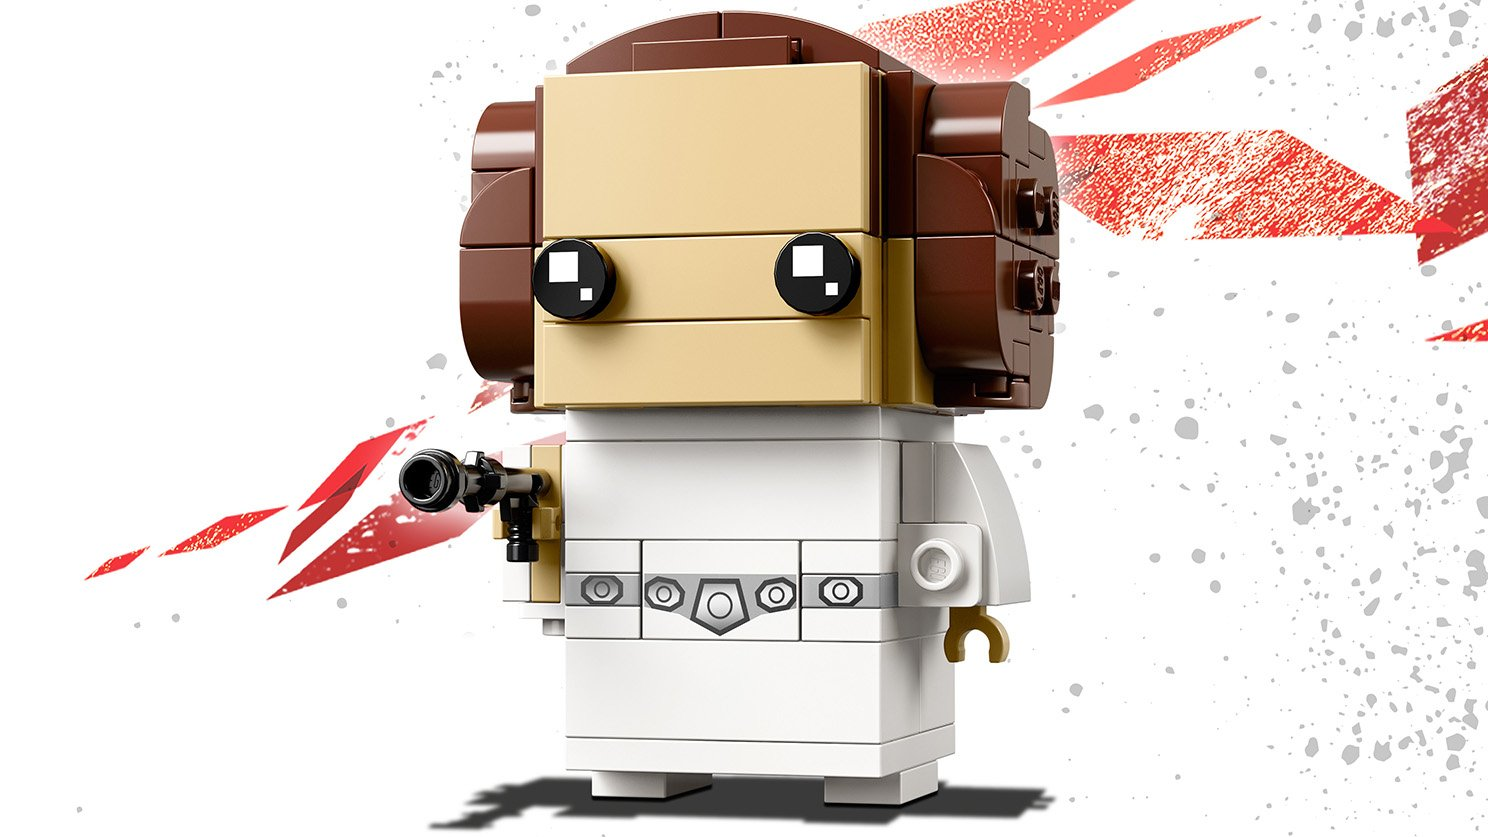 LEGO BrickHeadz Księżniczka Leia Organa™